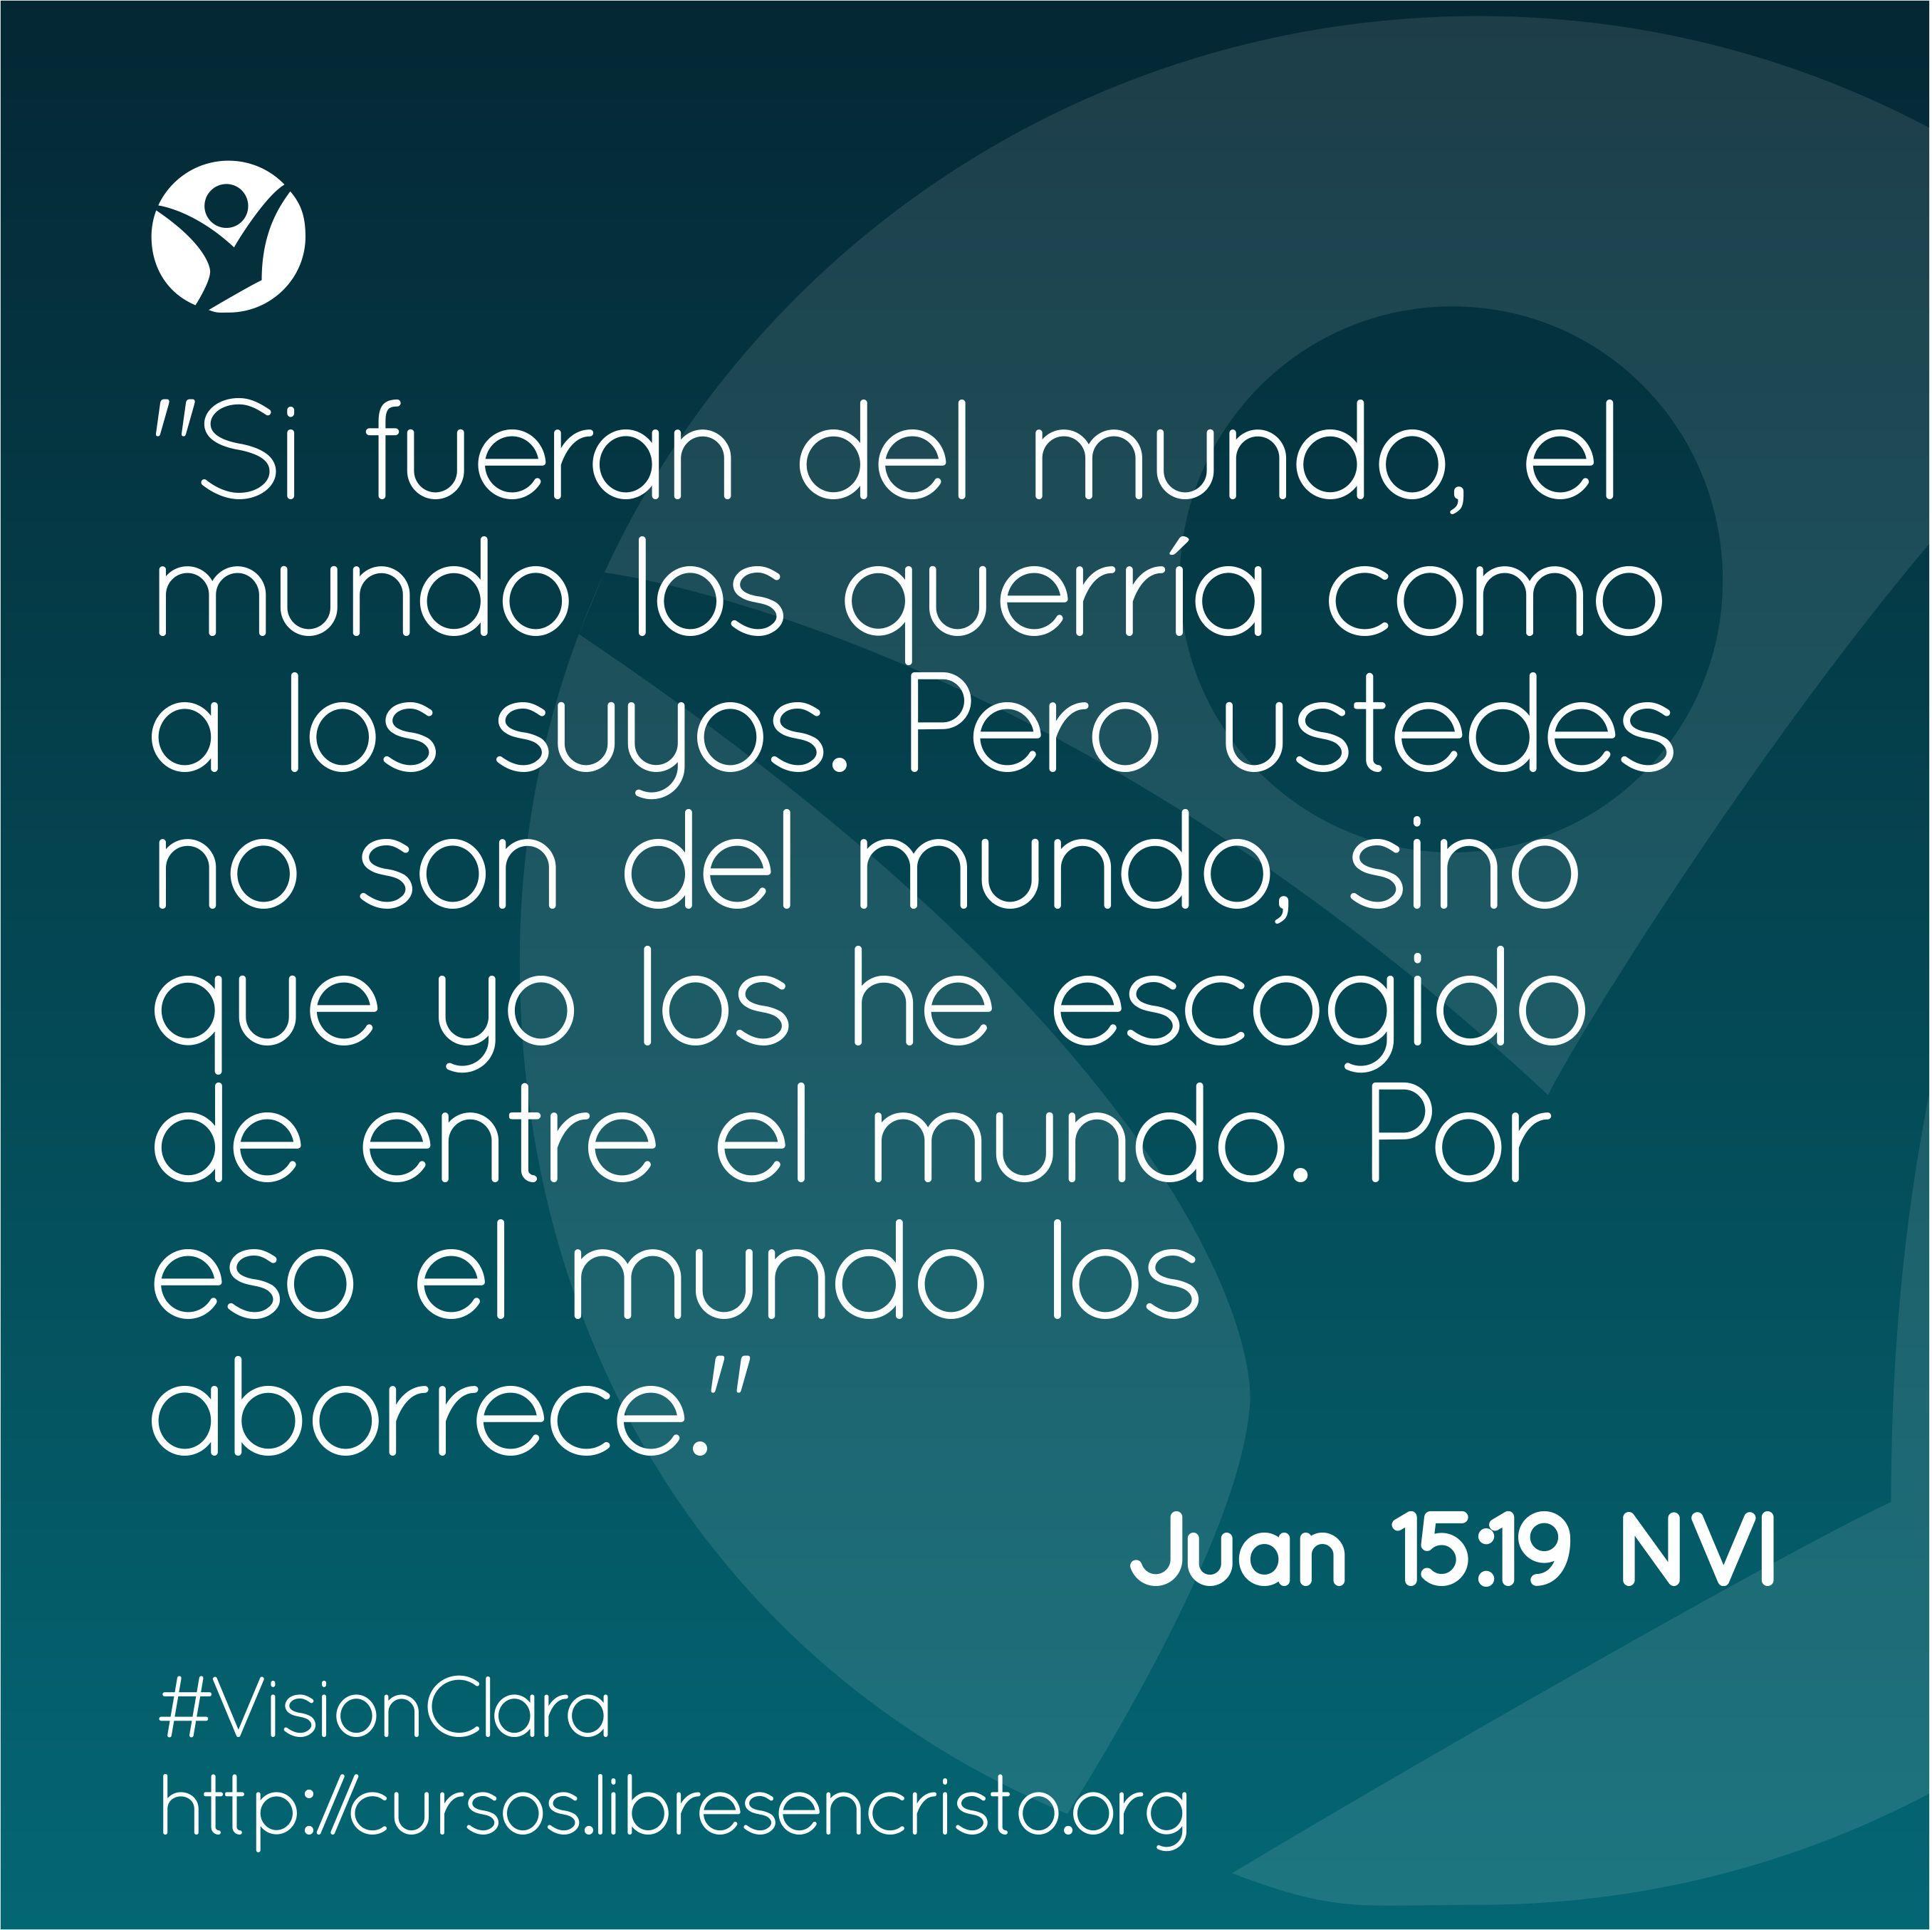 Biblia santidad libertad Dios pecado pureza ual restauracion corteradical